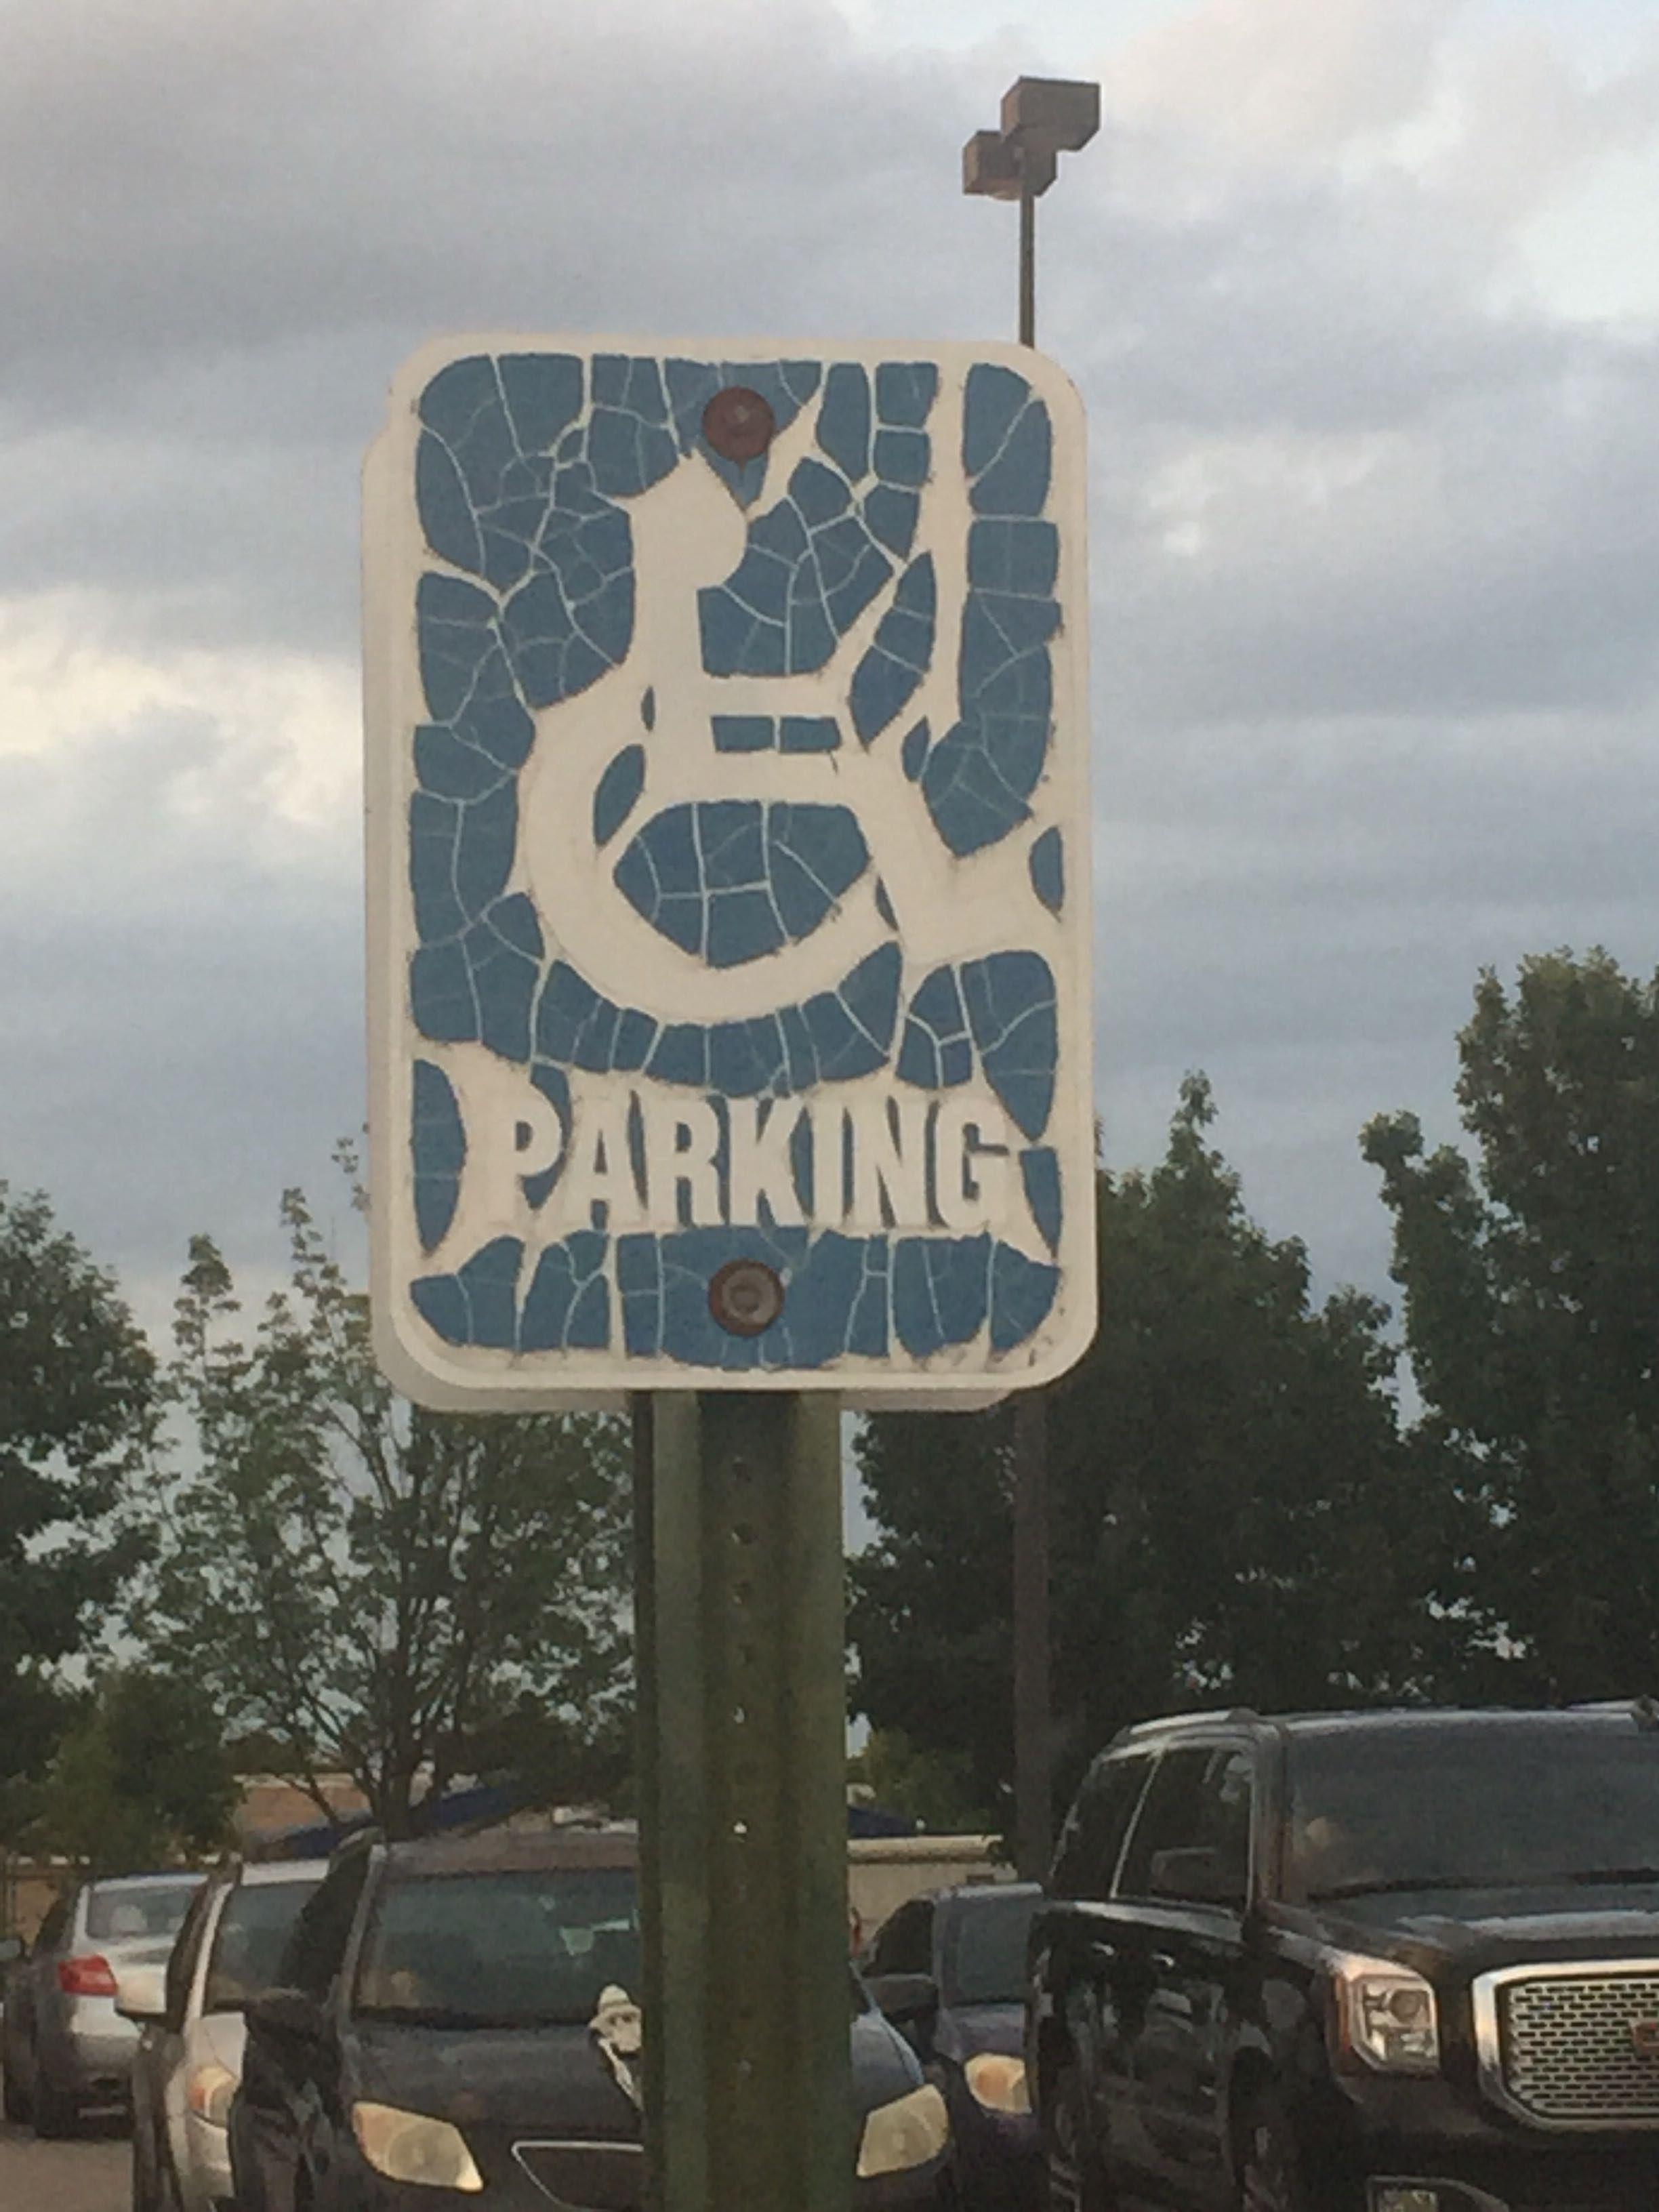 Handicap parking for Metallica fans